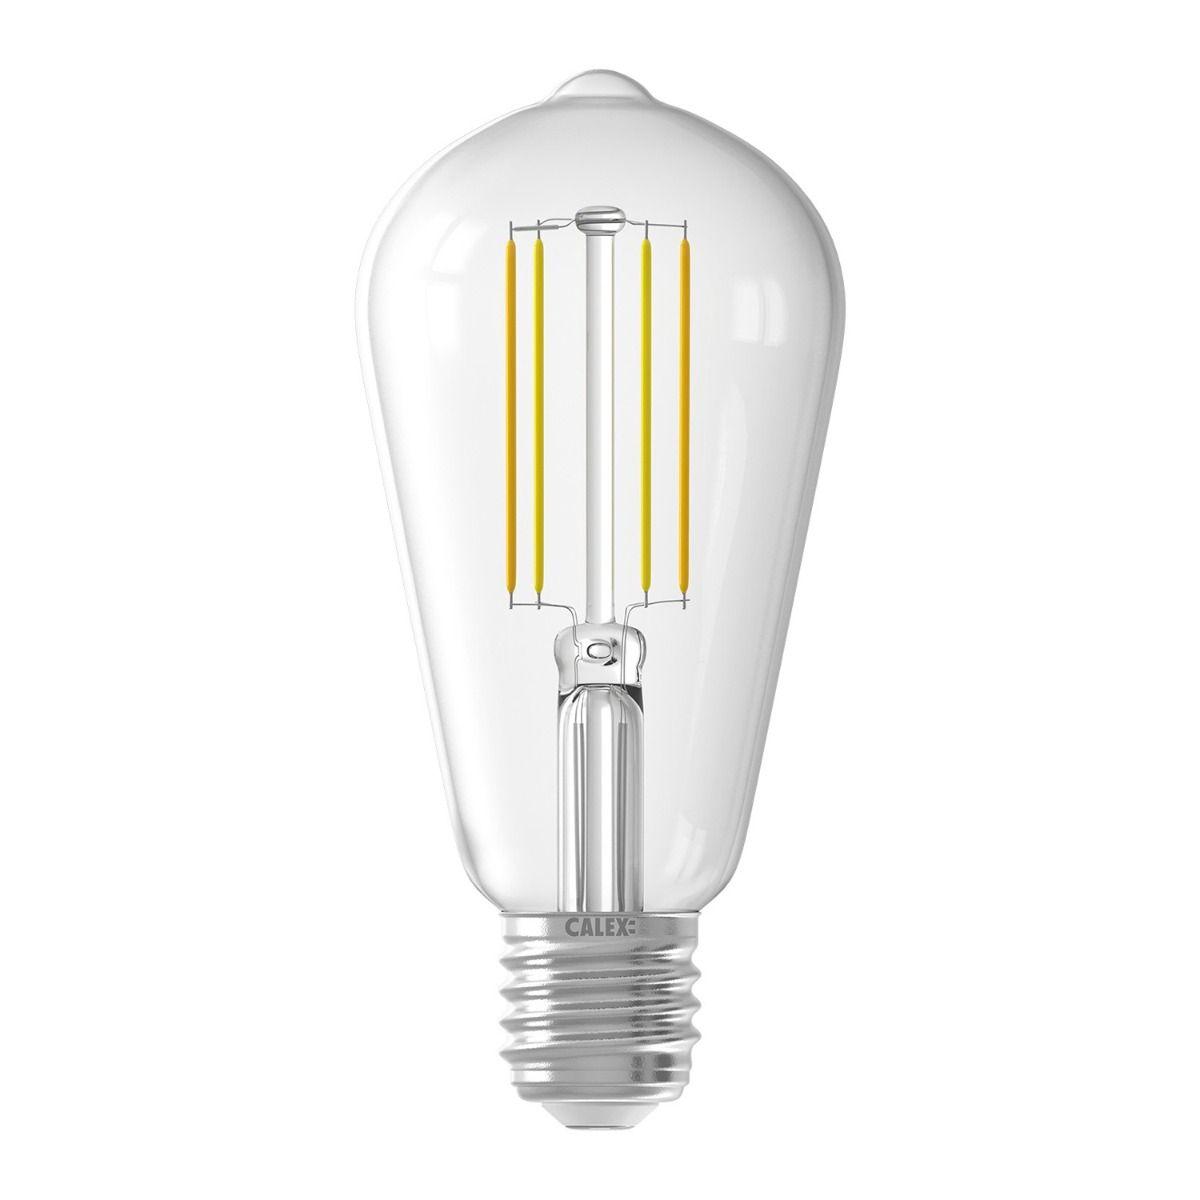 Calex Smart Rustikal Fadenlampe LED Glühbirne E27 7W 806lm 1800-3000  Tuya Wifi